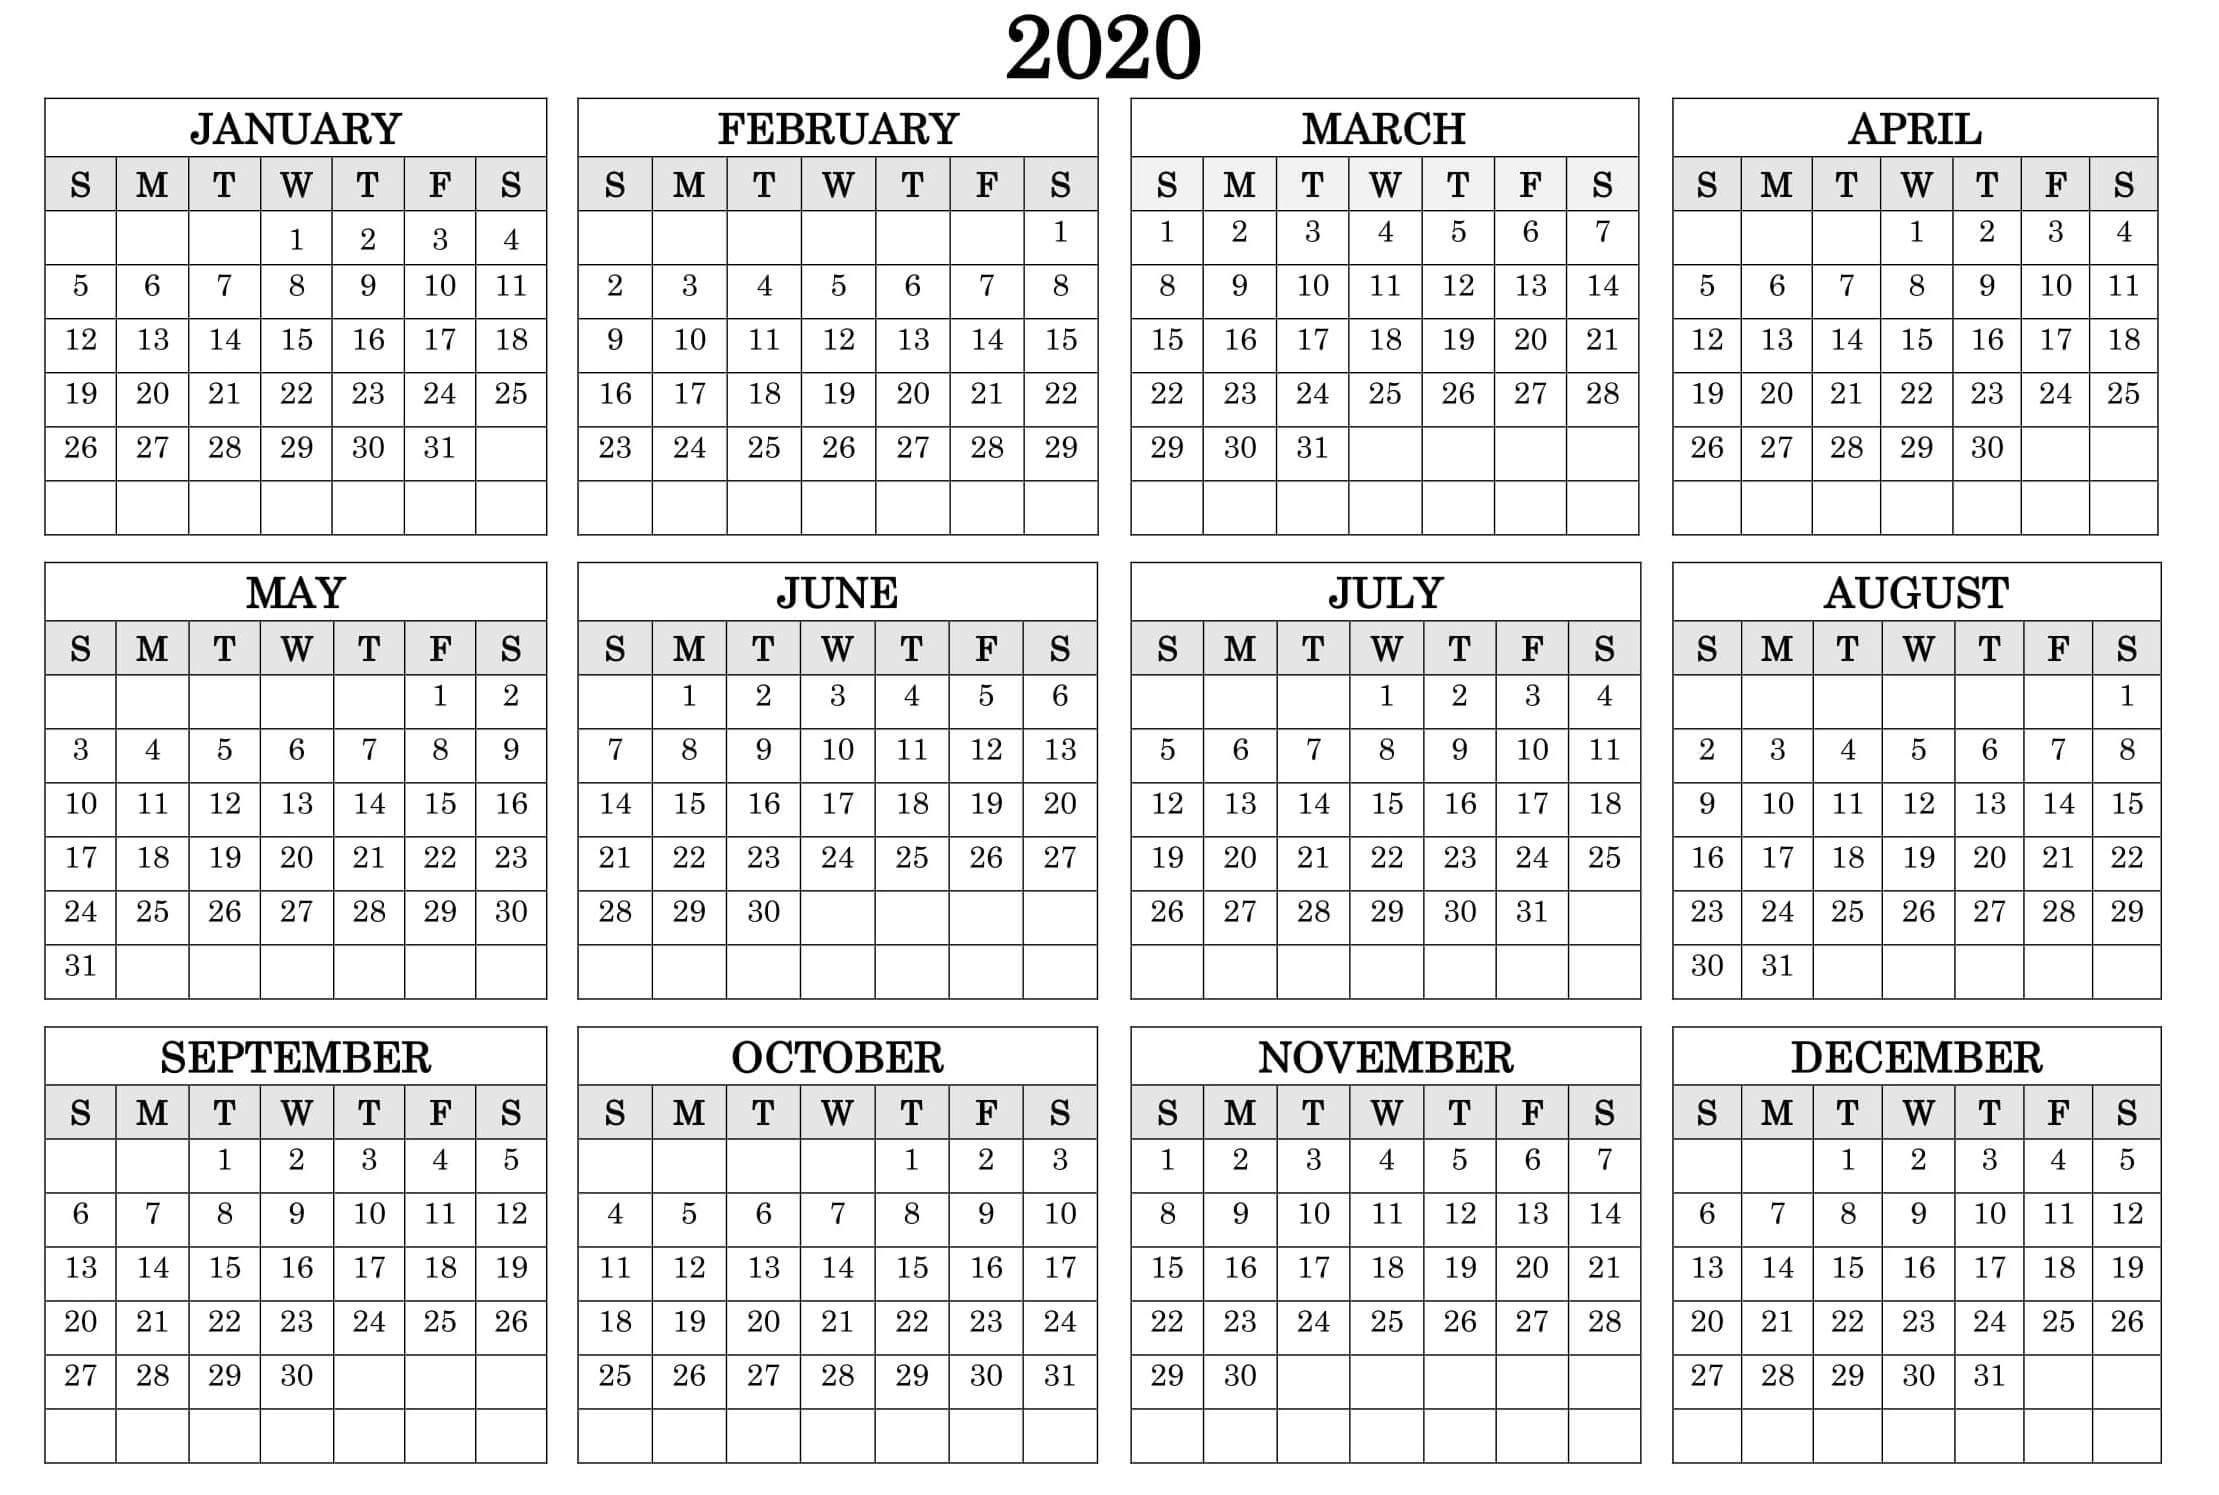 Yearly 2020 Calendar - Free 12 Month 2020 Calendar Printable 1